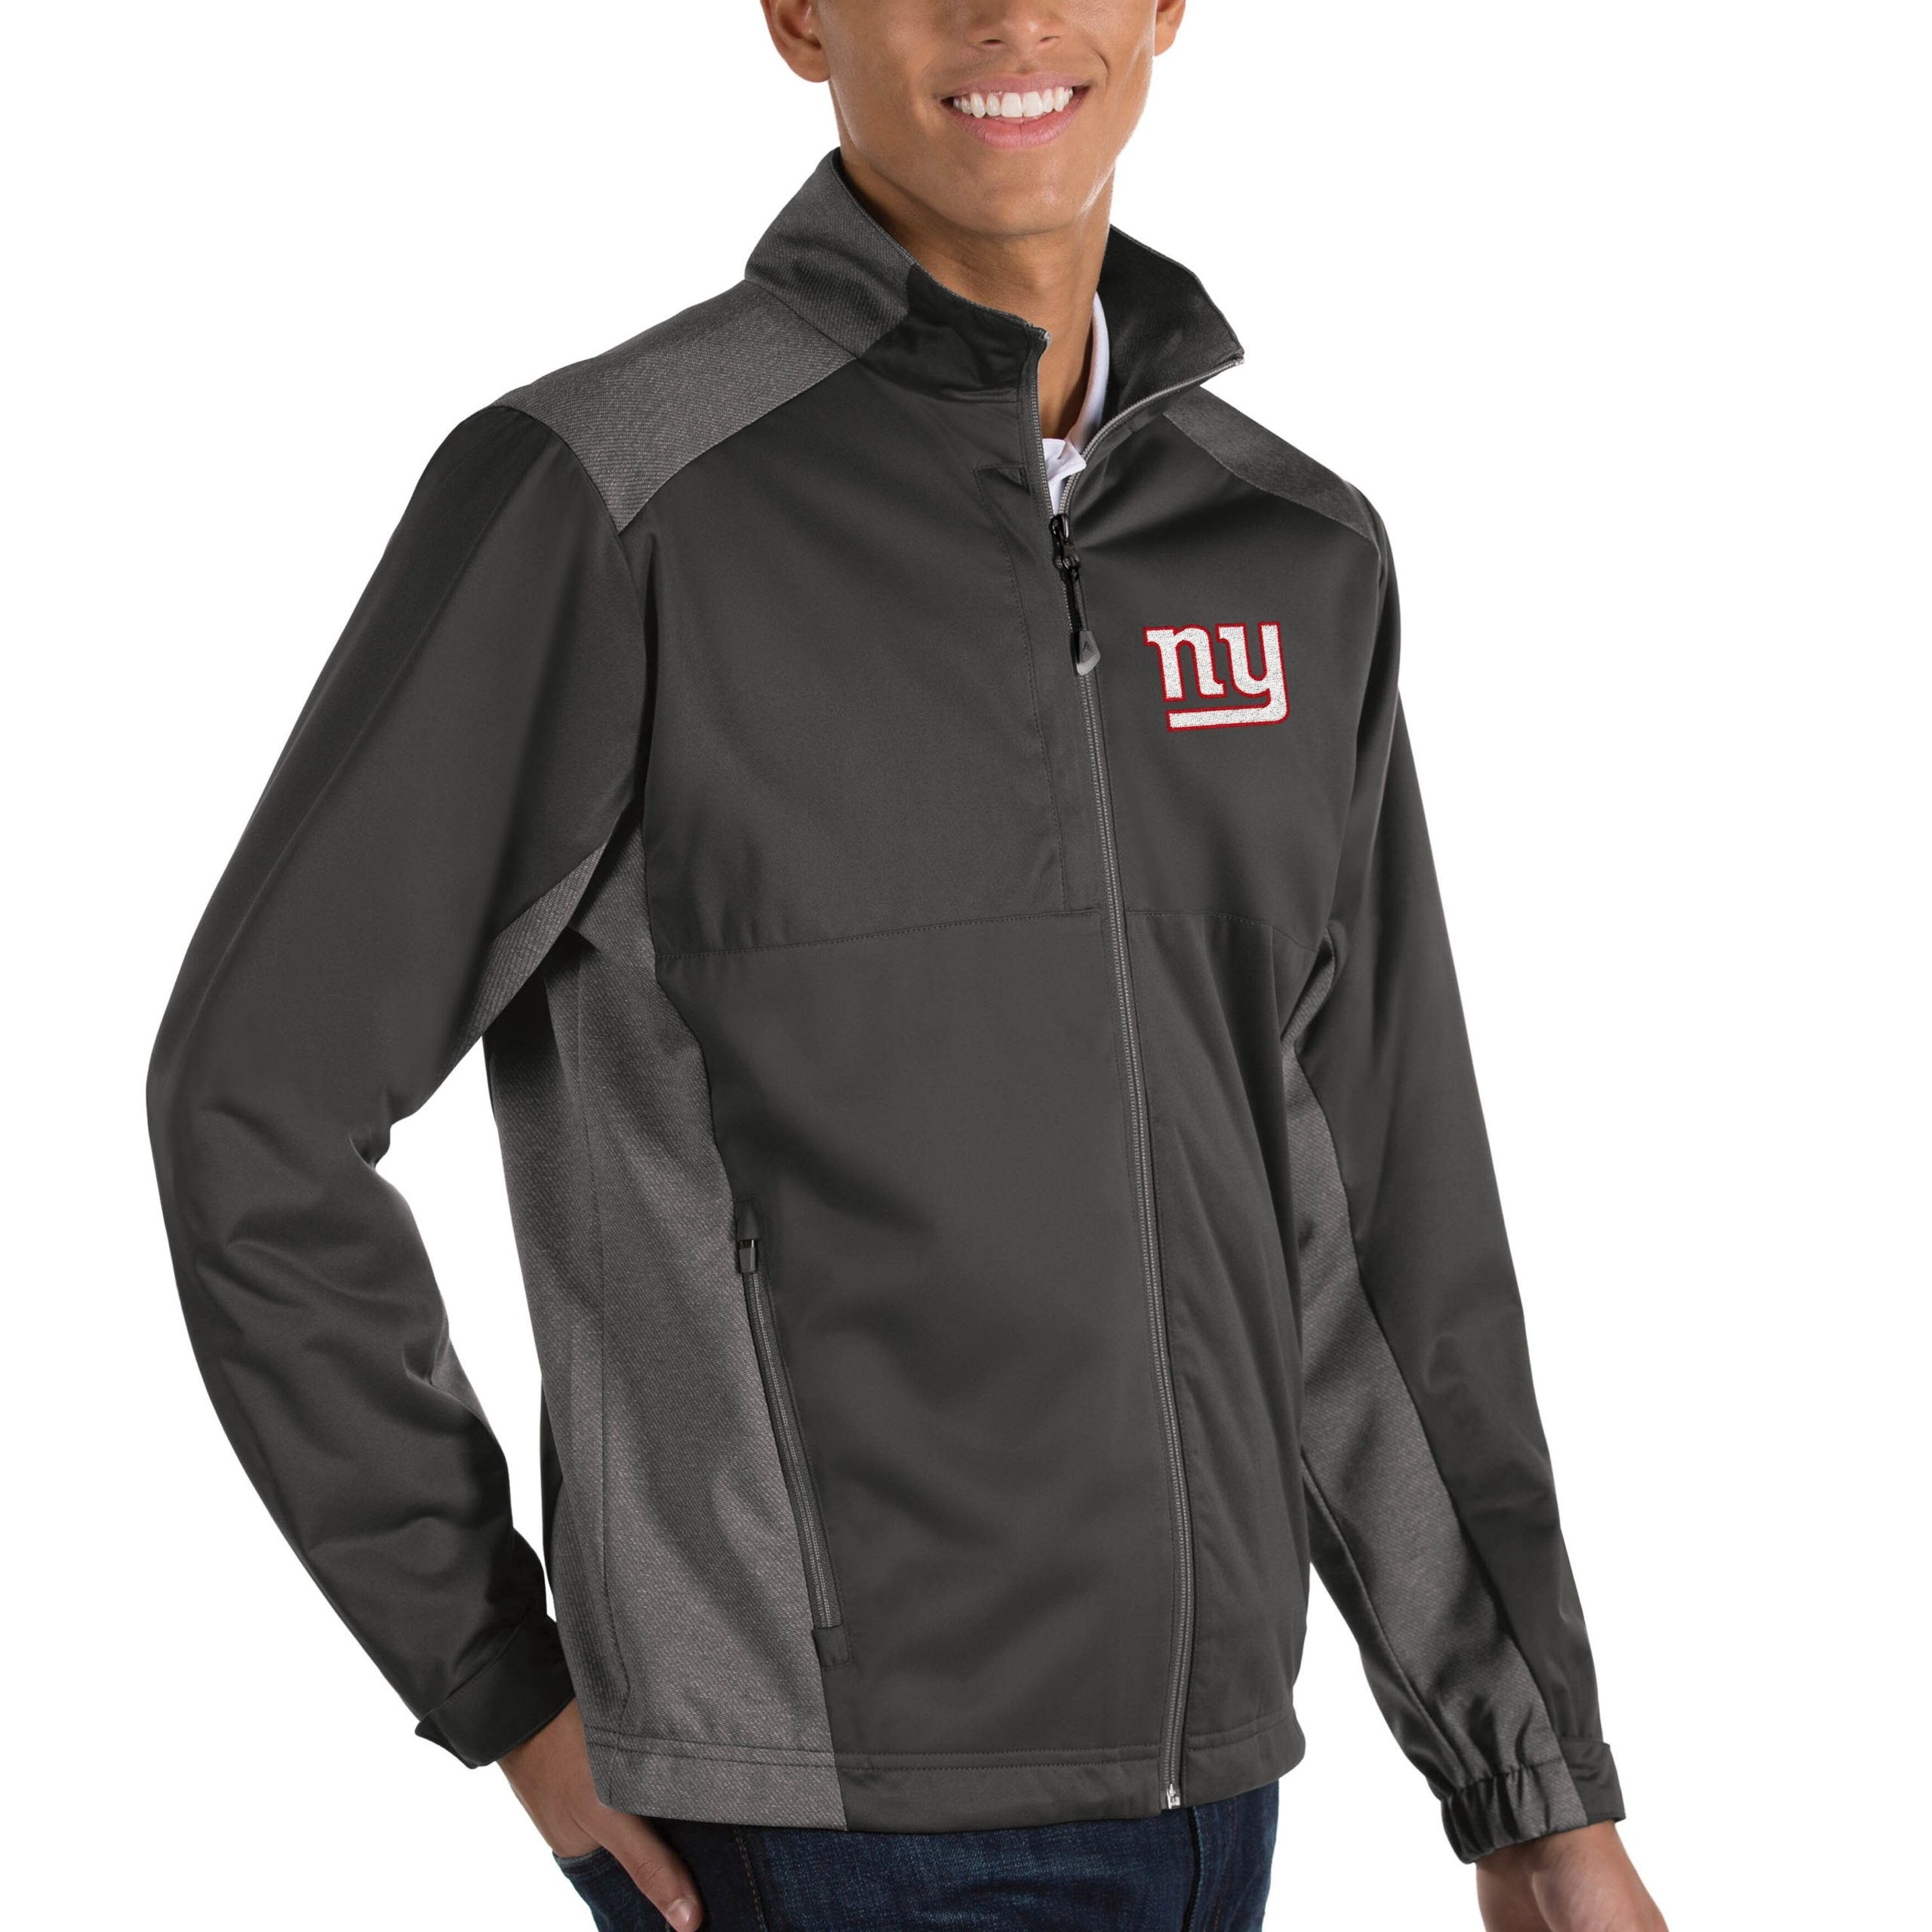 New York Giants Antigua Revolve Big & Tall Full-Zip Jacket - Heather Charcoal